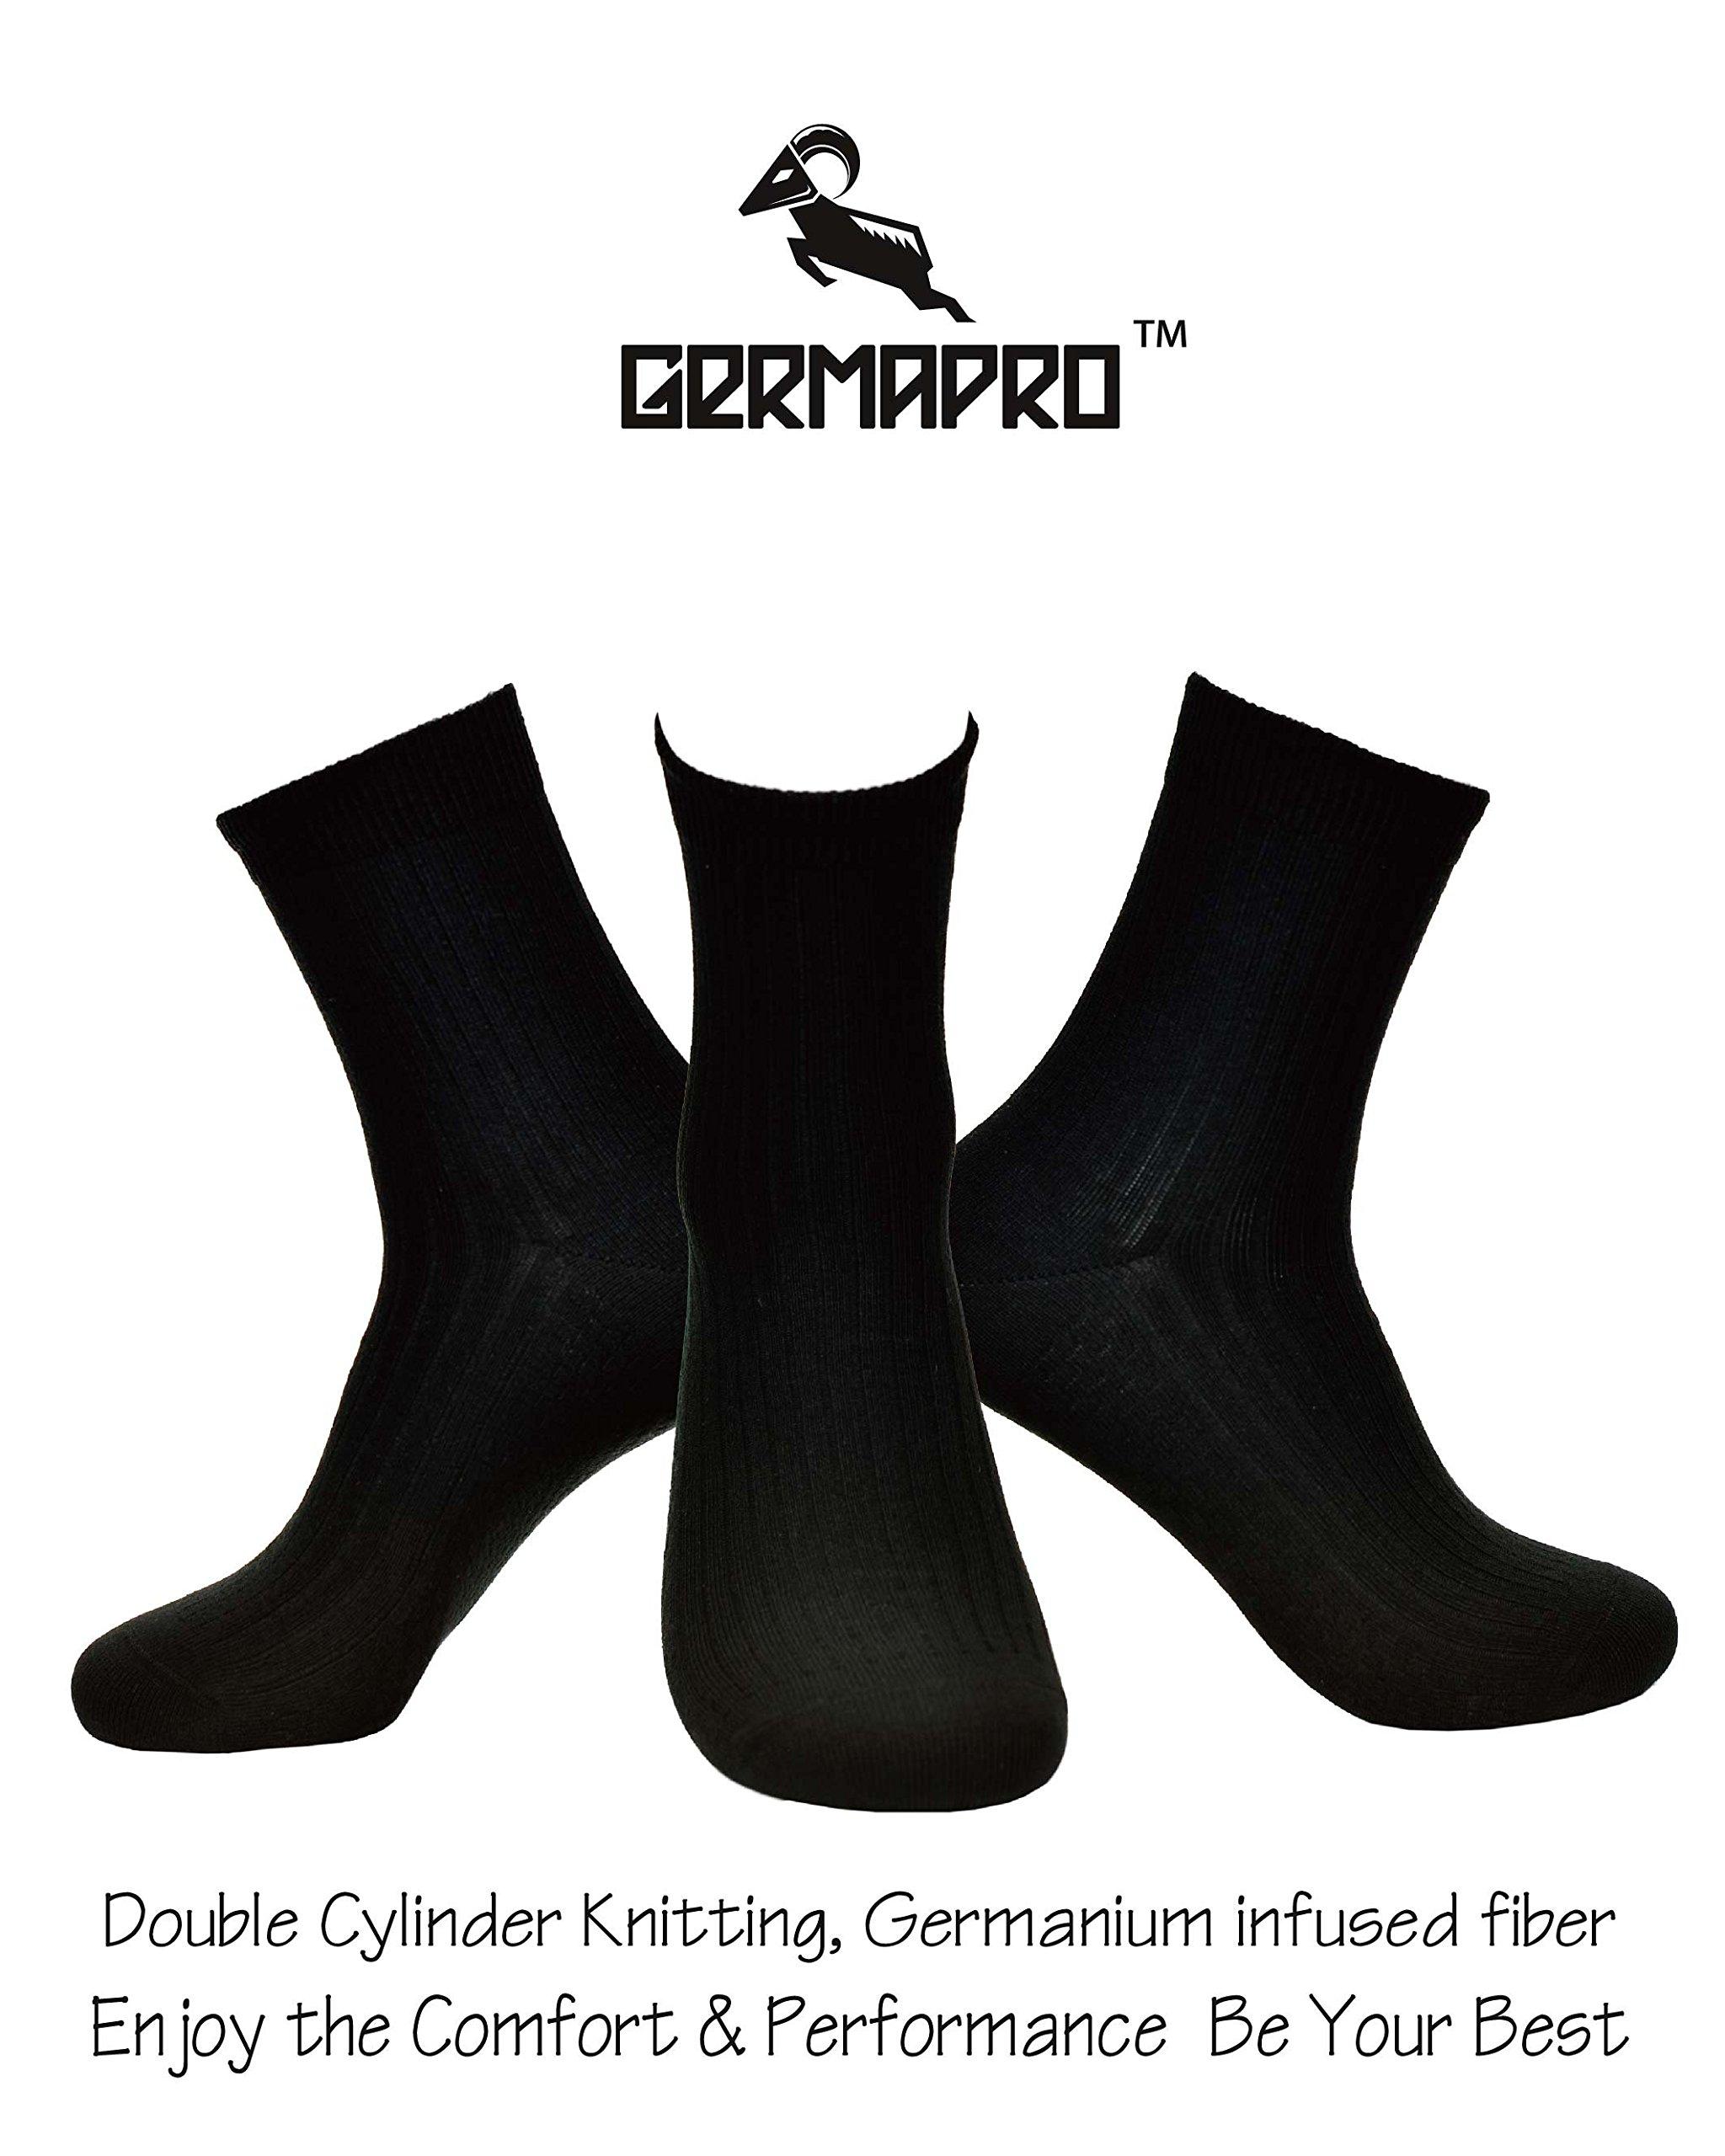 Men's Germanium Infused Anti Bacterial Anti Fungal Anti Odor Functional Circulation Mid Crew Dress Socks (Black, Large) by GERMAPRO (Image #5)